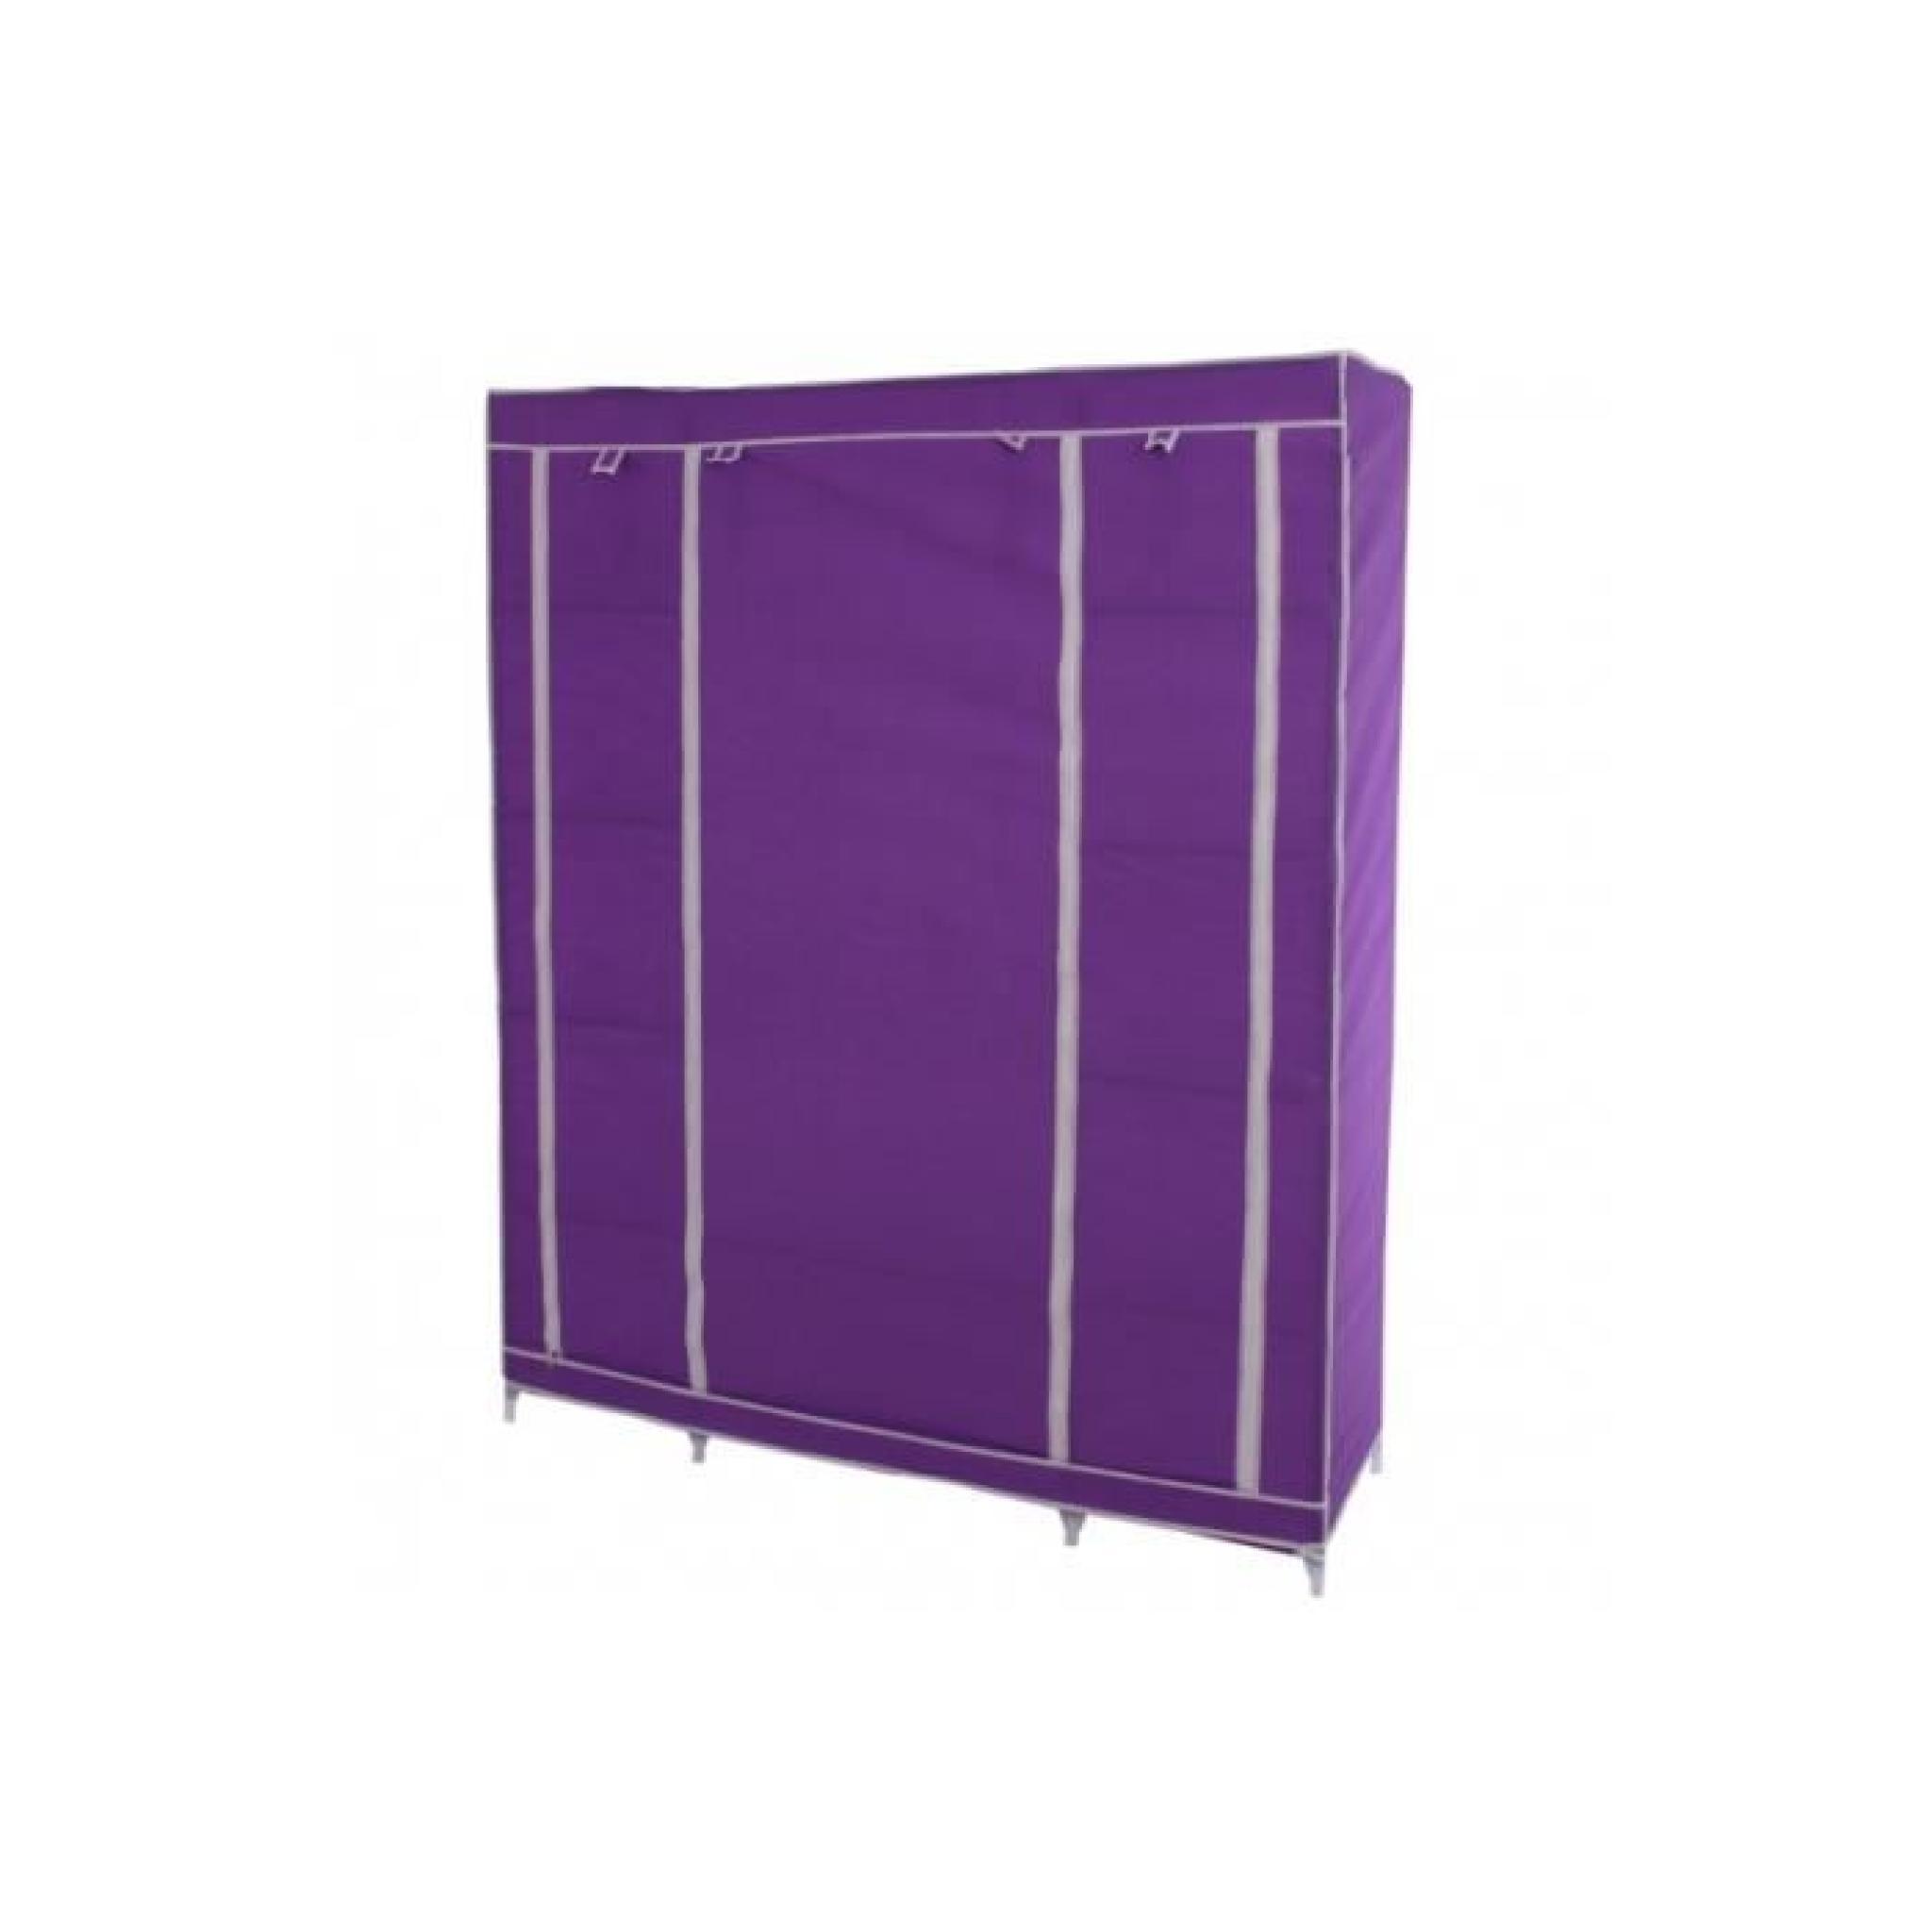 Placard pliant armoire Camping penderie 173x135x45cm ~ Violet